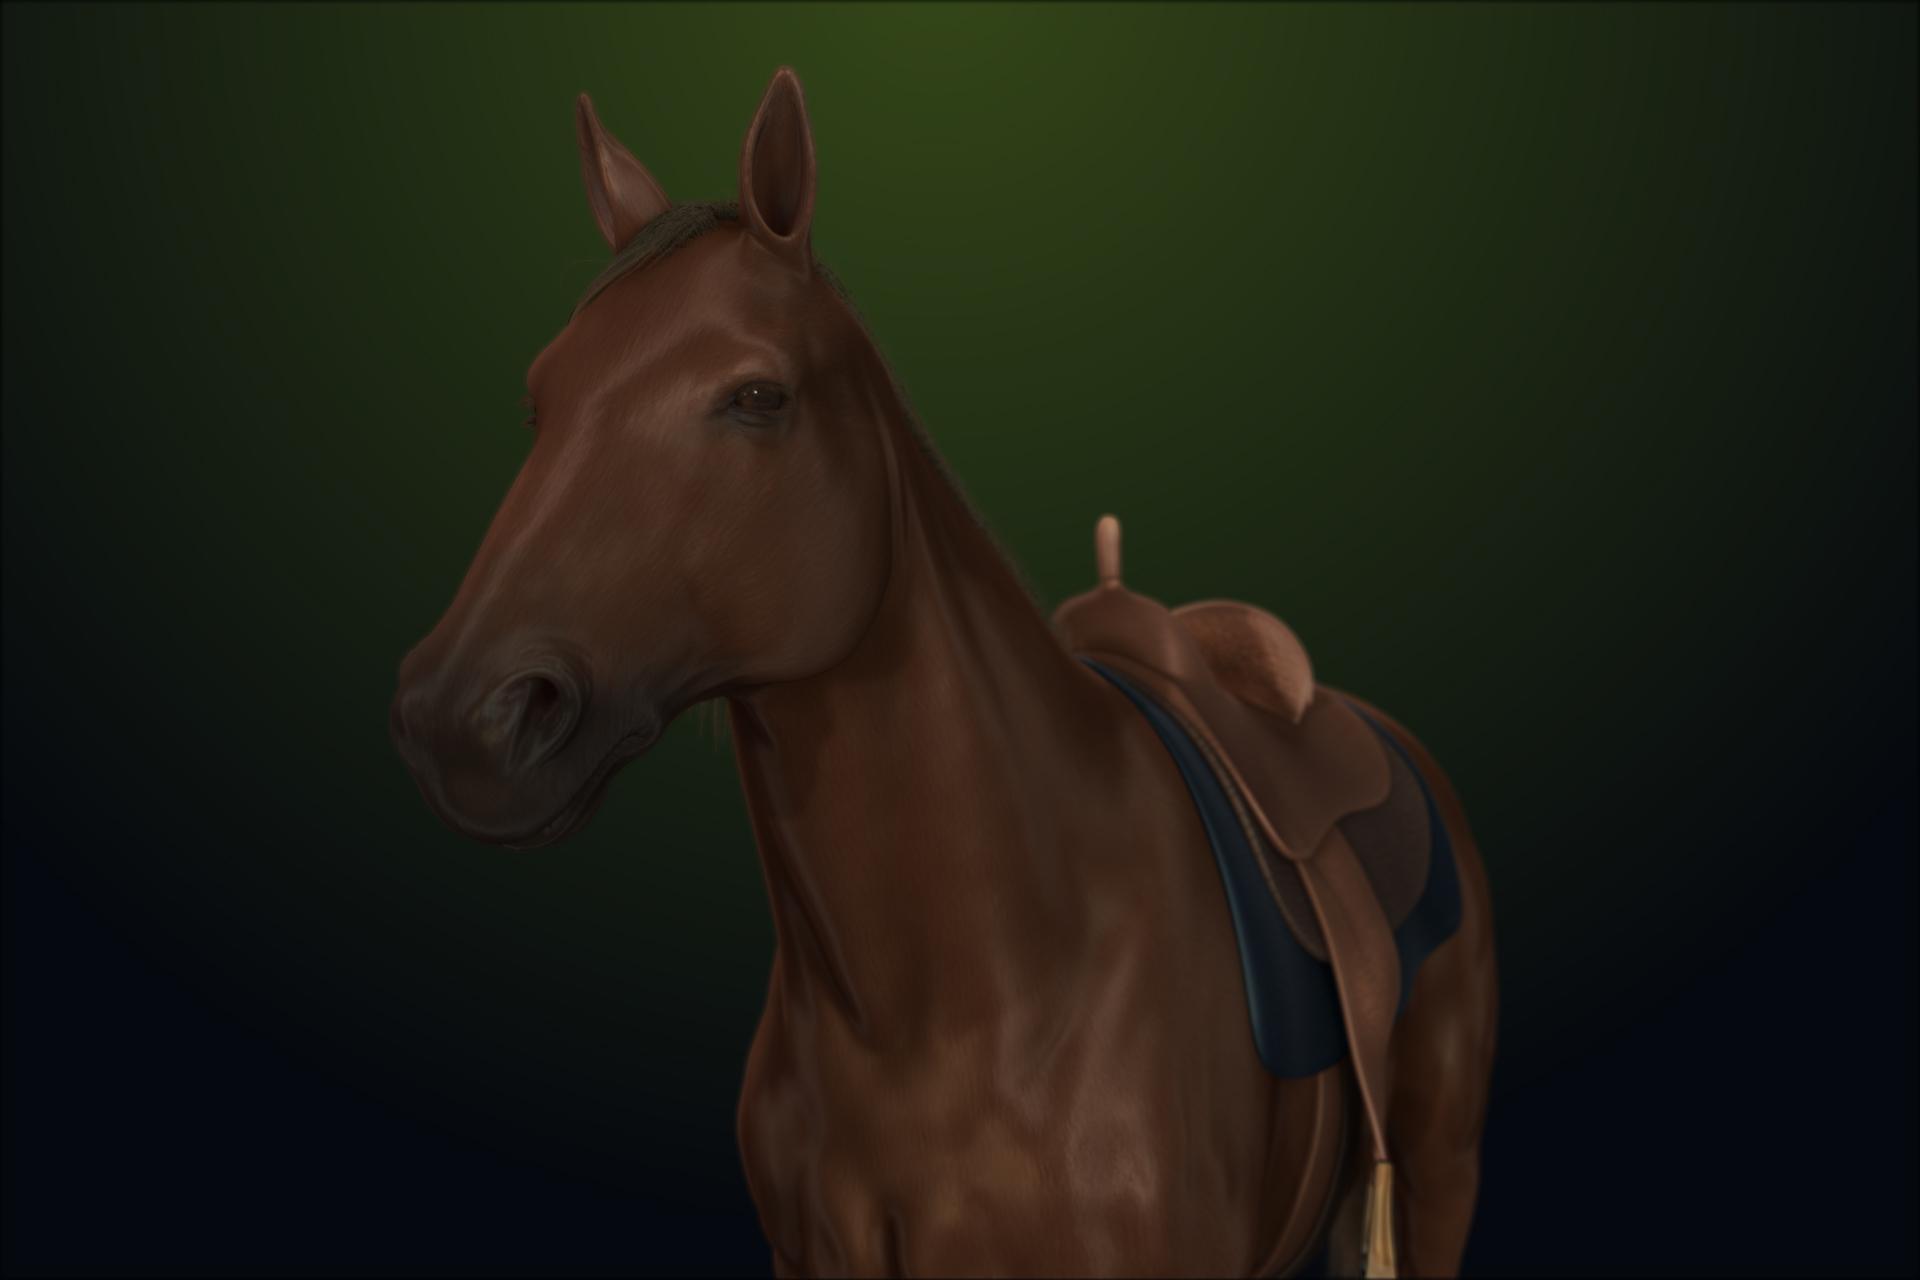 toby - American Quarter Horse